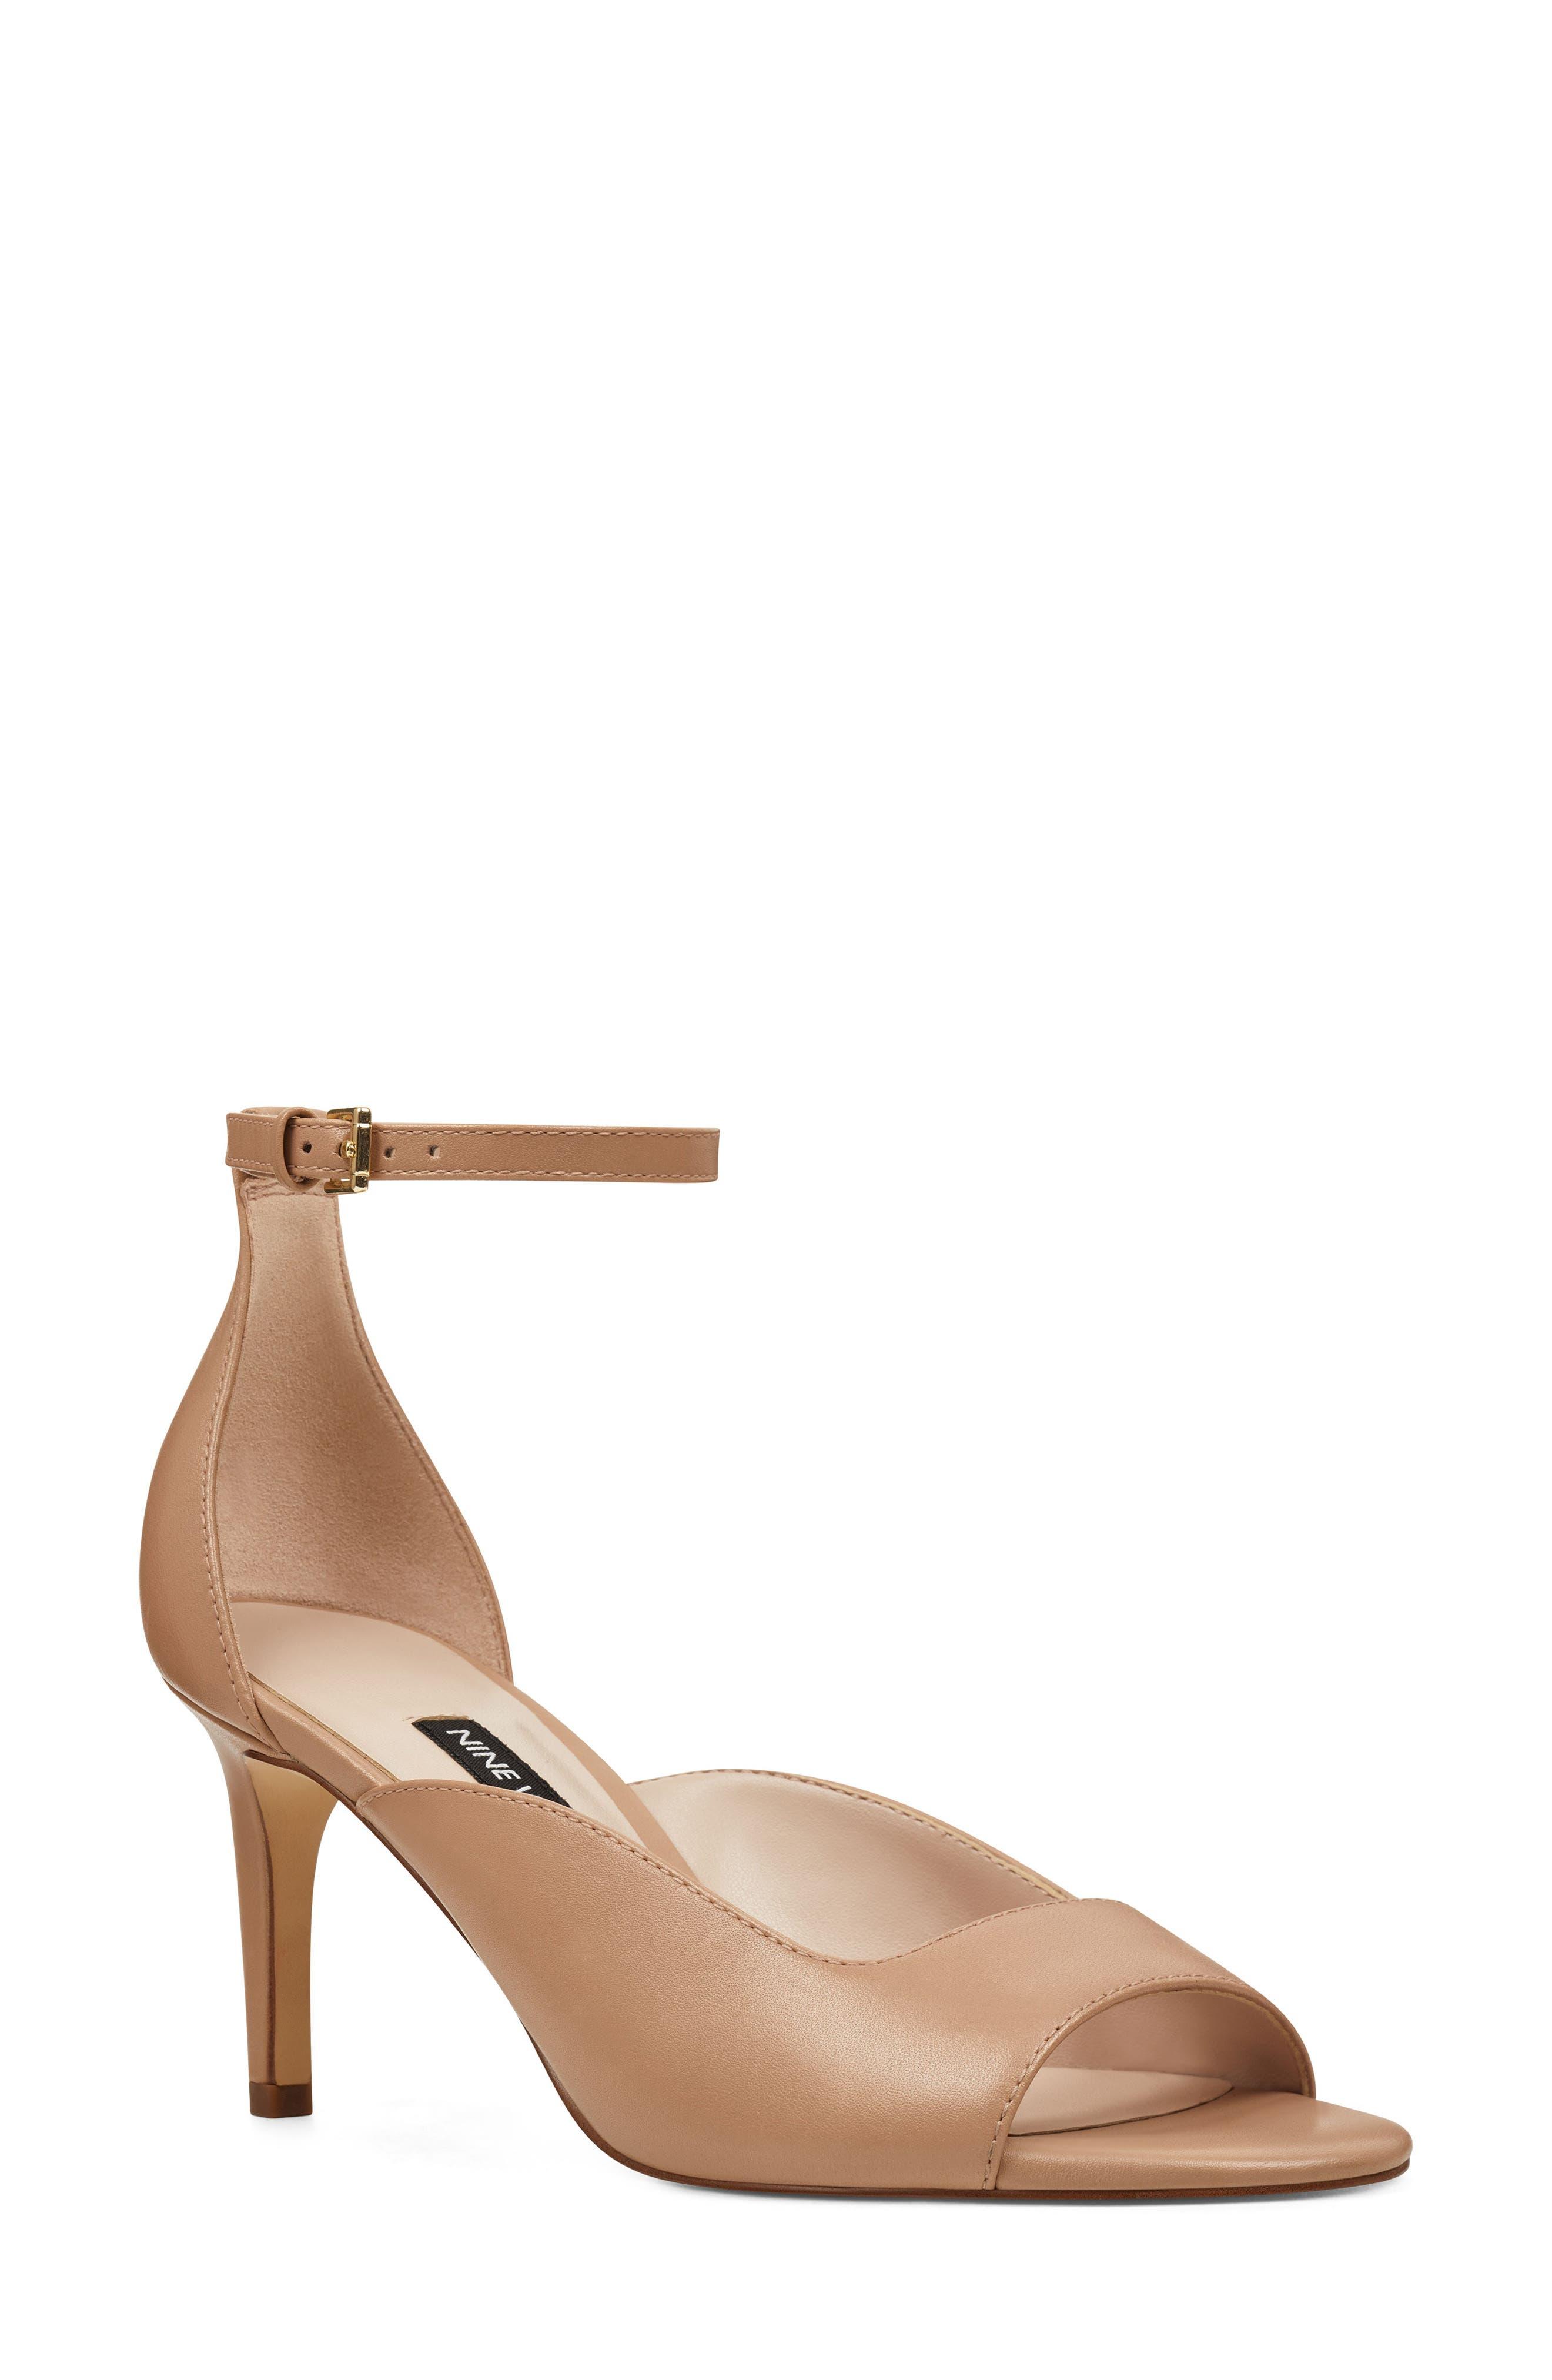 Nine West Avielle Ankle Strap Sandal, Beige